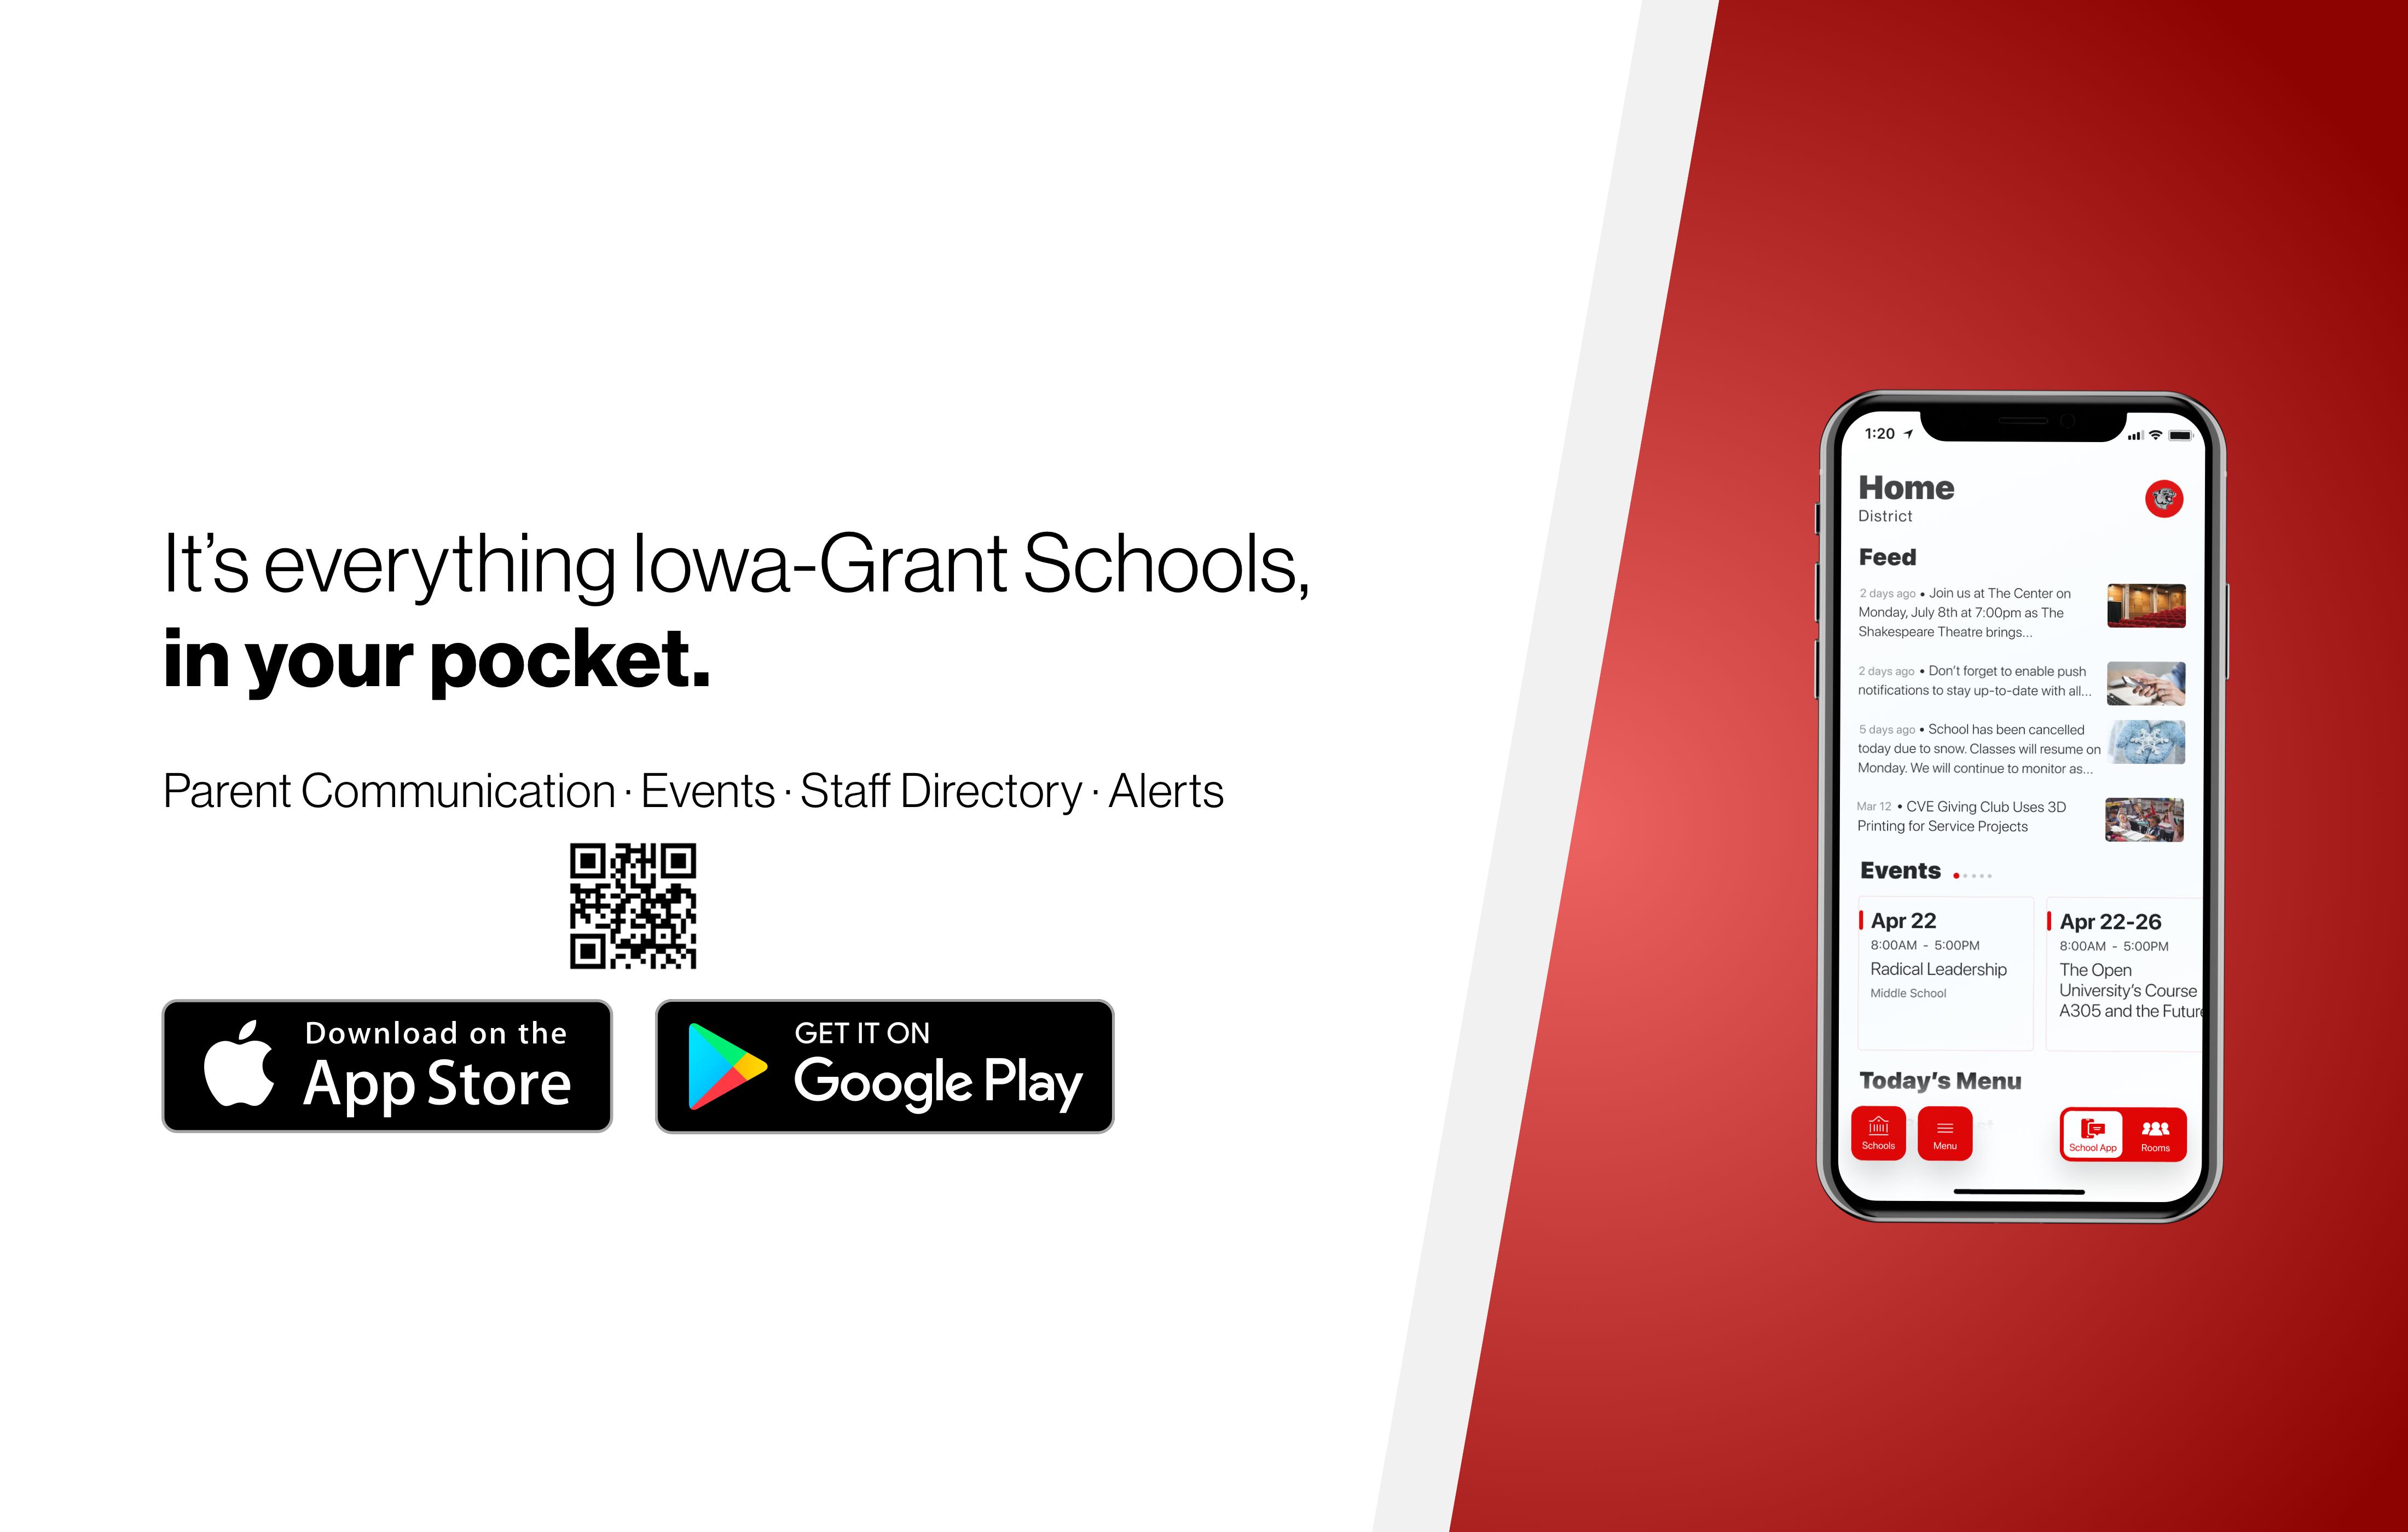 Banner promoting the Iowa-Grant App.